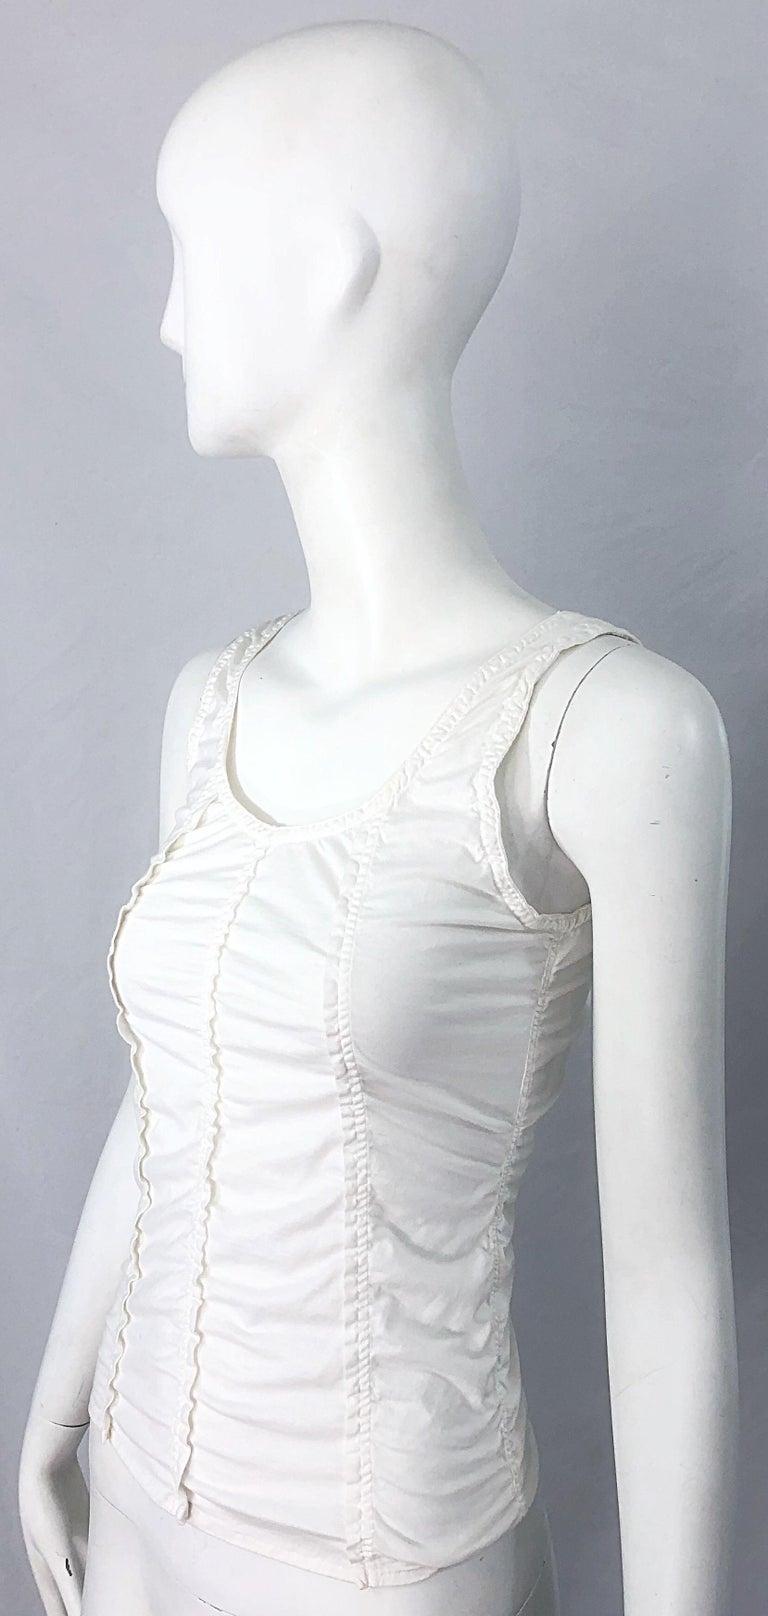 Tom Ford for Yves Saint Laurent White Cotton Ruffled Tank Top Shirt Blouse YSL For Sale 1